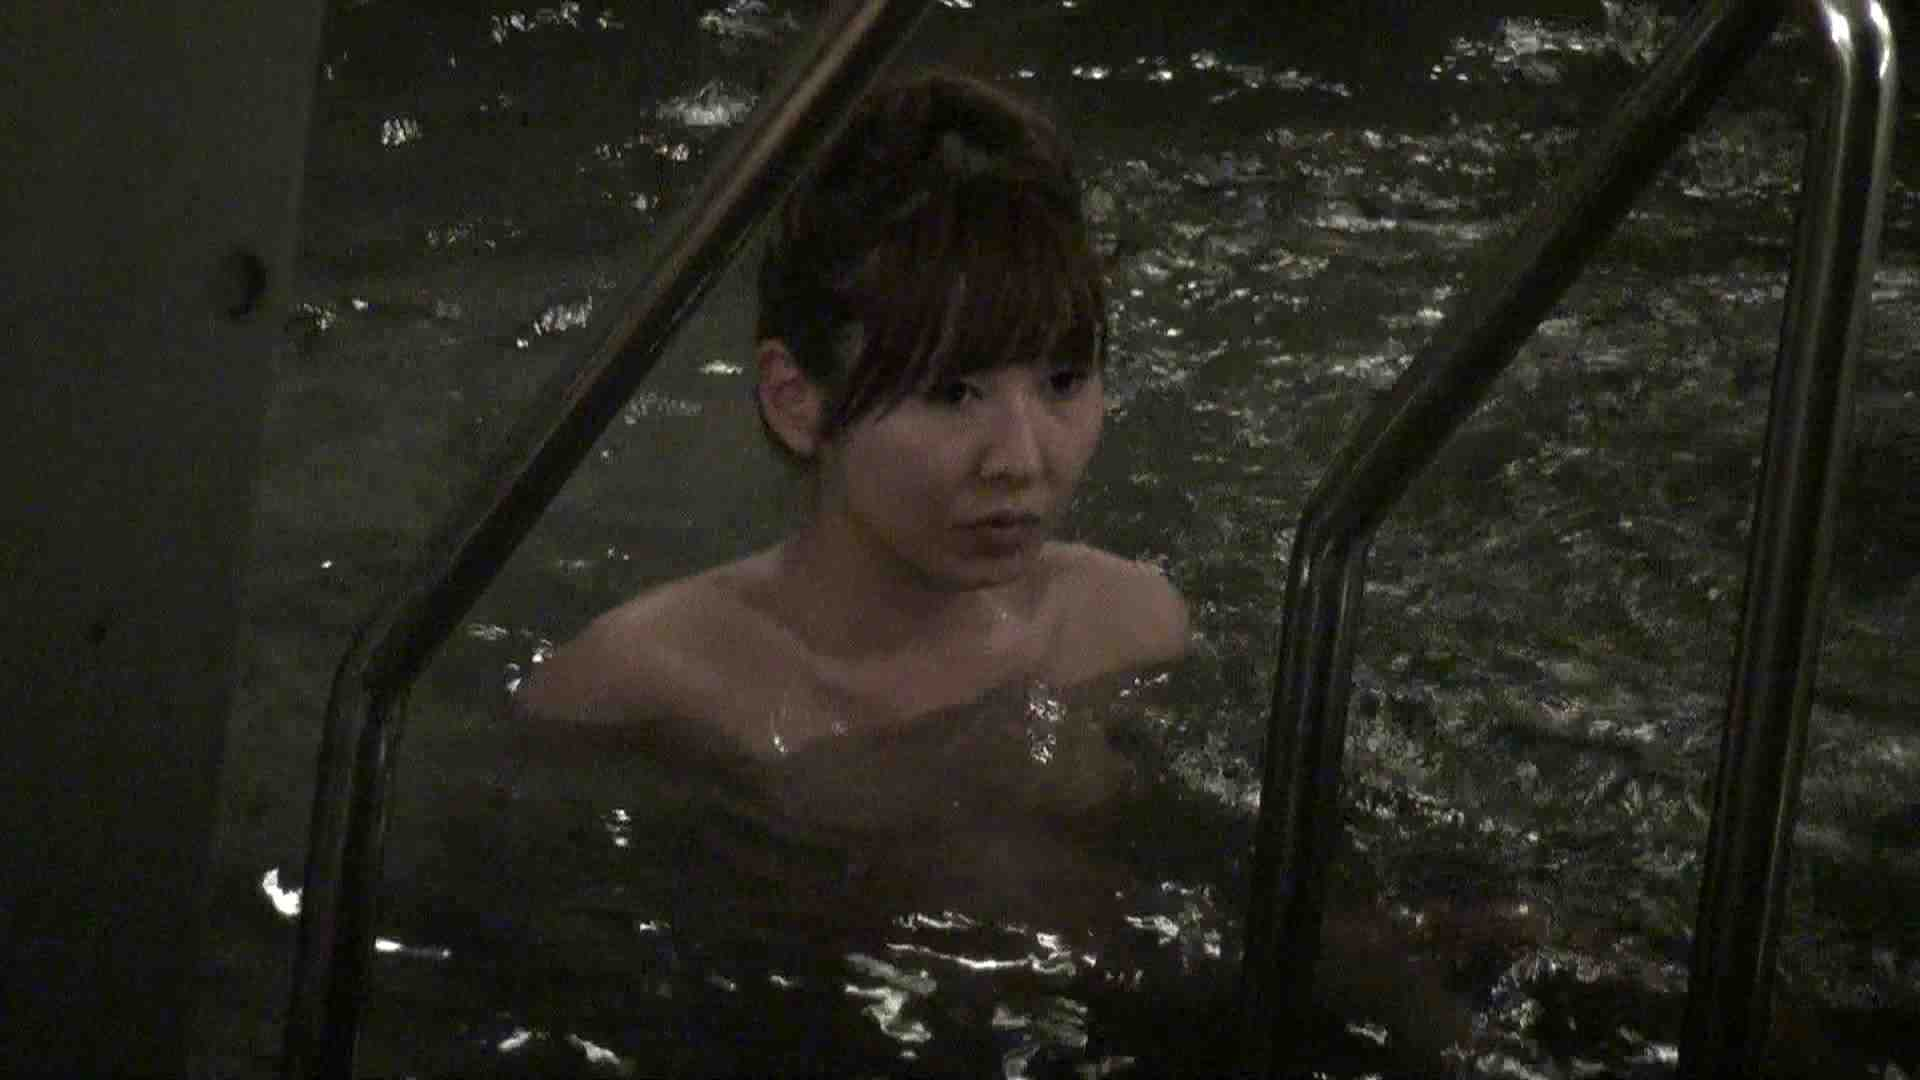 Aquaな露天風呂Vol.410 露天風呂編  94PIX 84